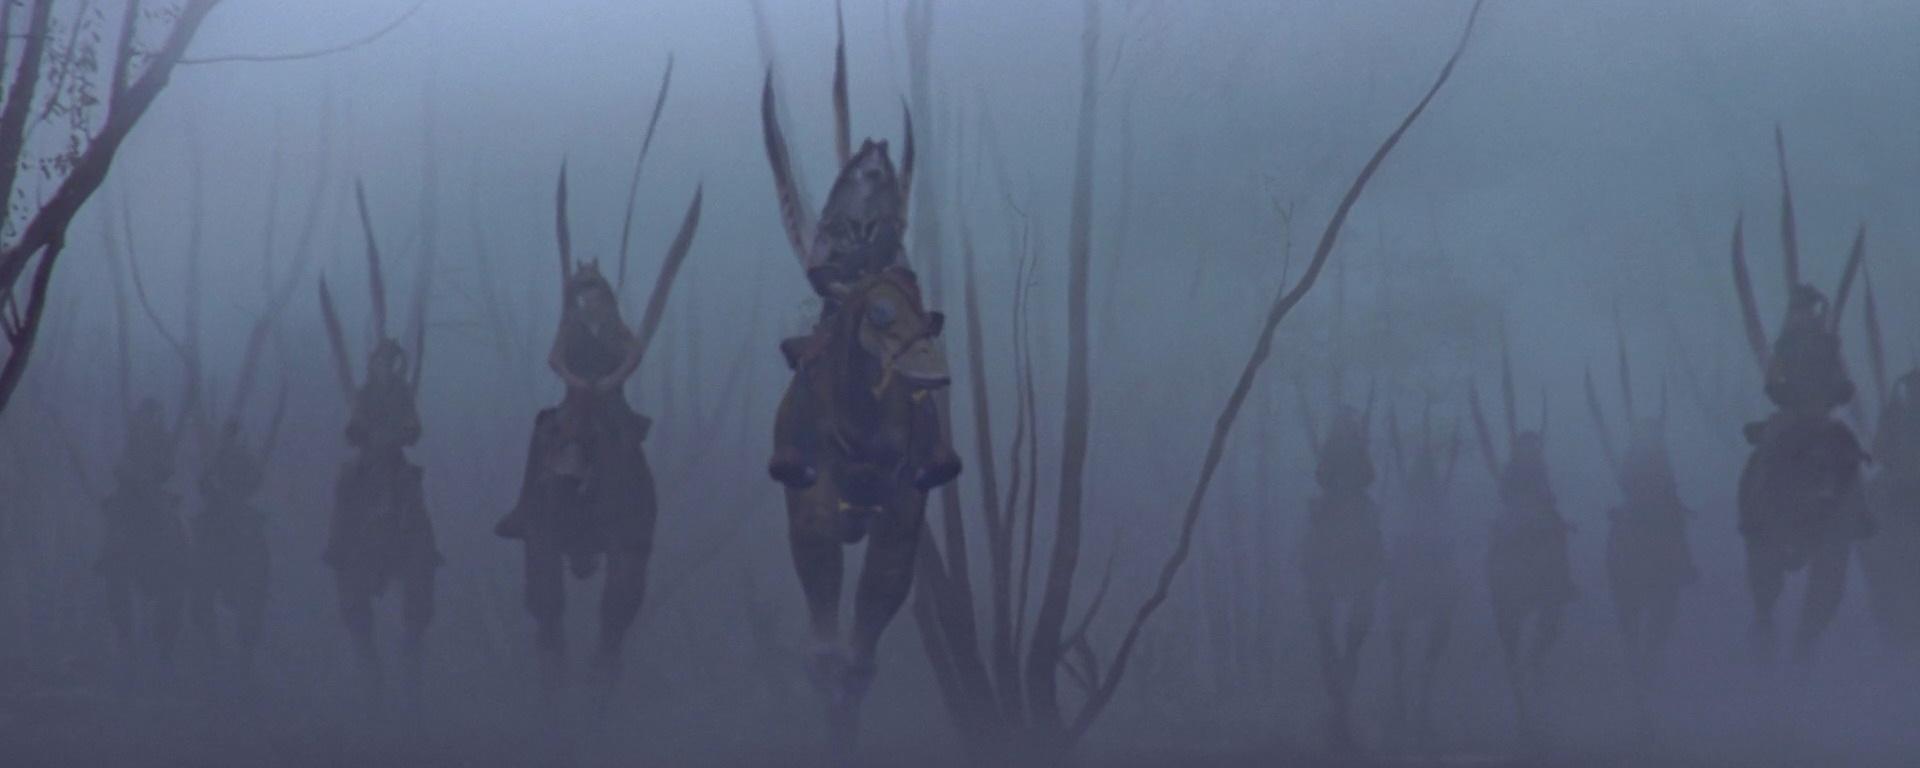 Image result for gungan phantom menace mist